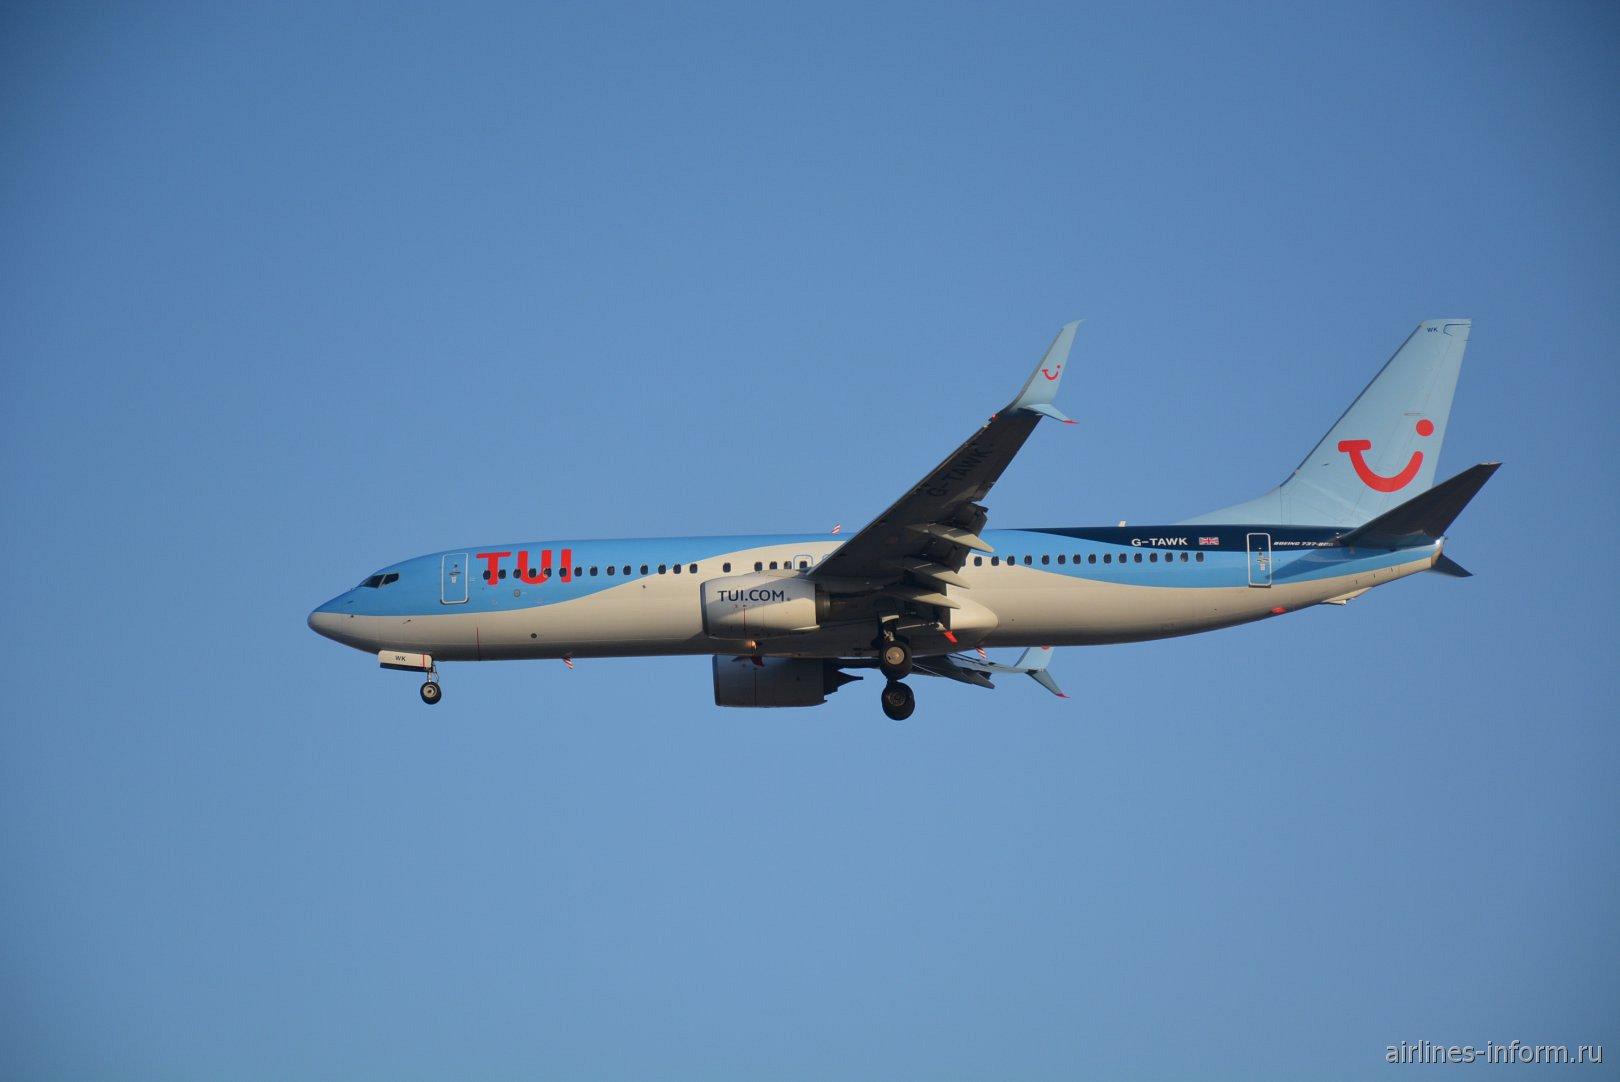 Boeing 737-800 с номером G-TAWK авиакомпании Thomson Airways